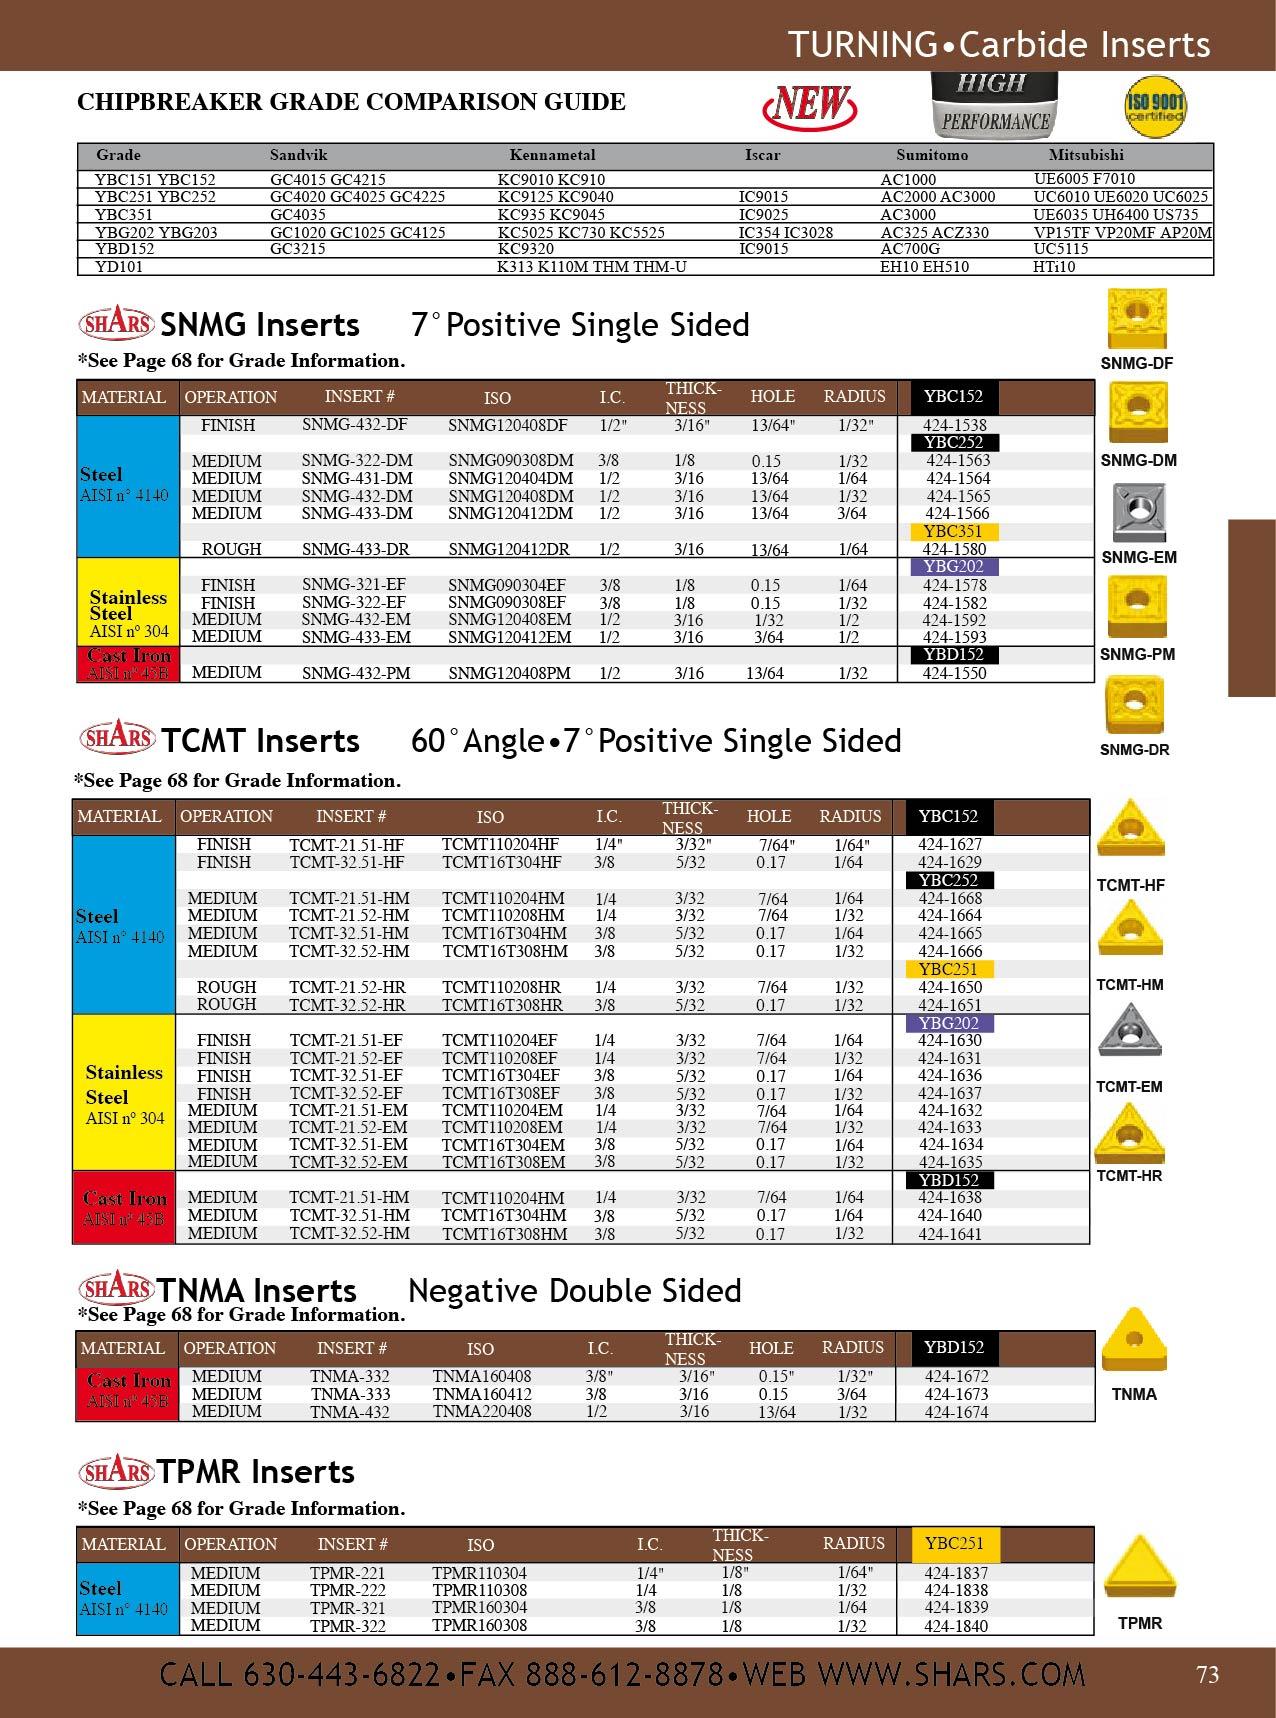 SHARS ZCC 5PCS  DCMT 32.51 HM YBC252 CARBIDE INSERT FOR ALLOY STEEL NEW !{